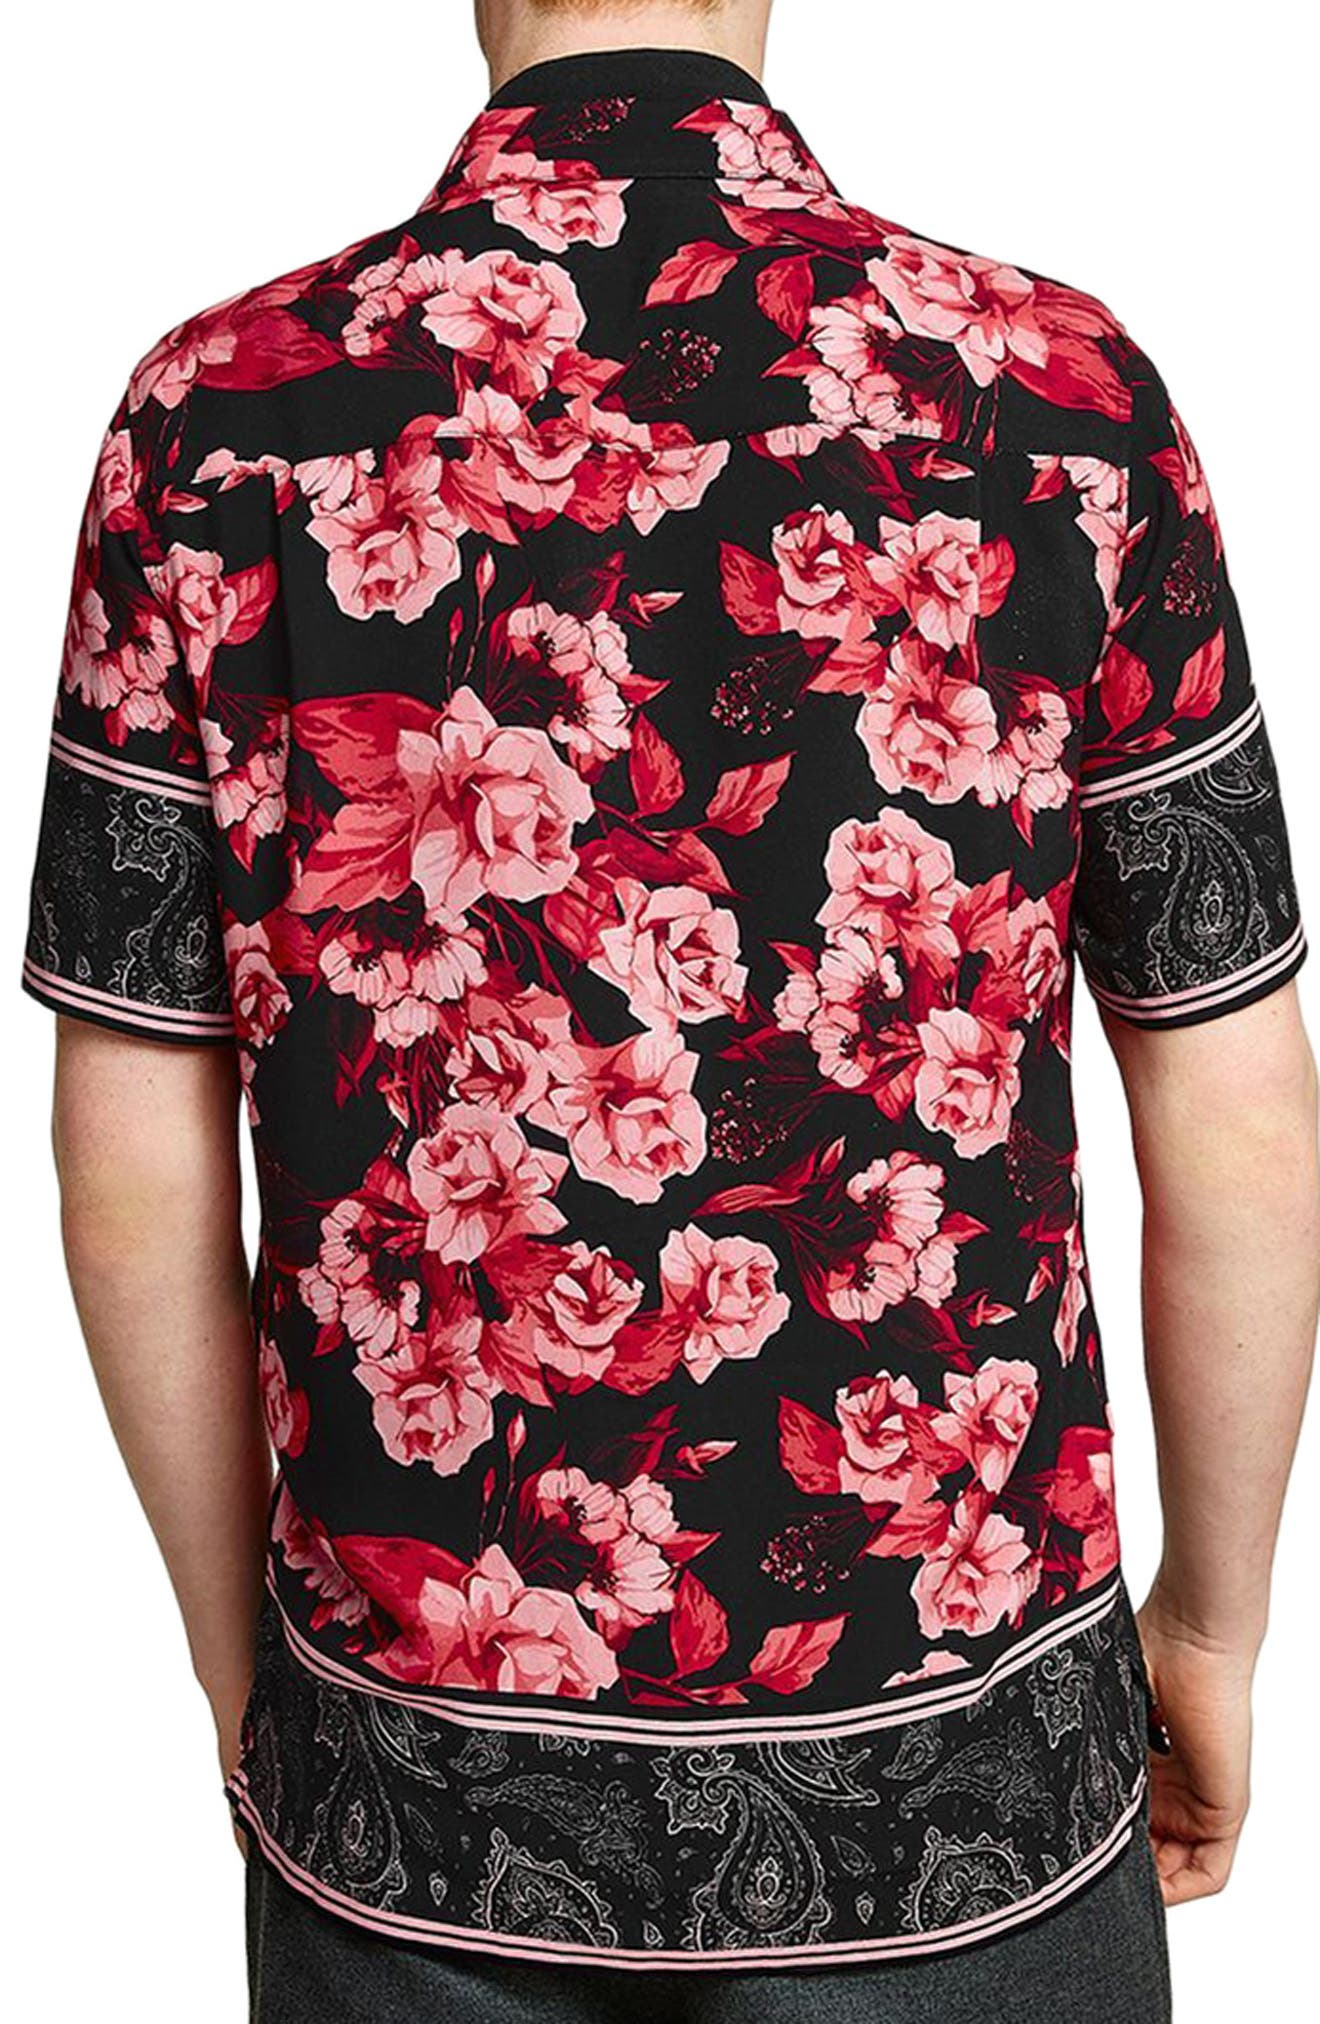 TOPMAN,                             Floral Print Shirt,                             Alternate thumbnail 2, color,                             640